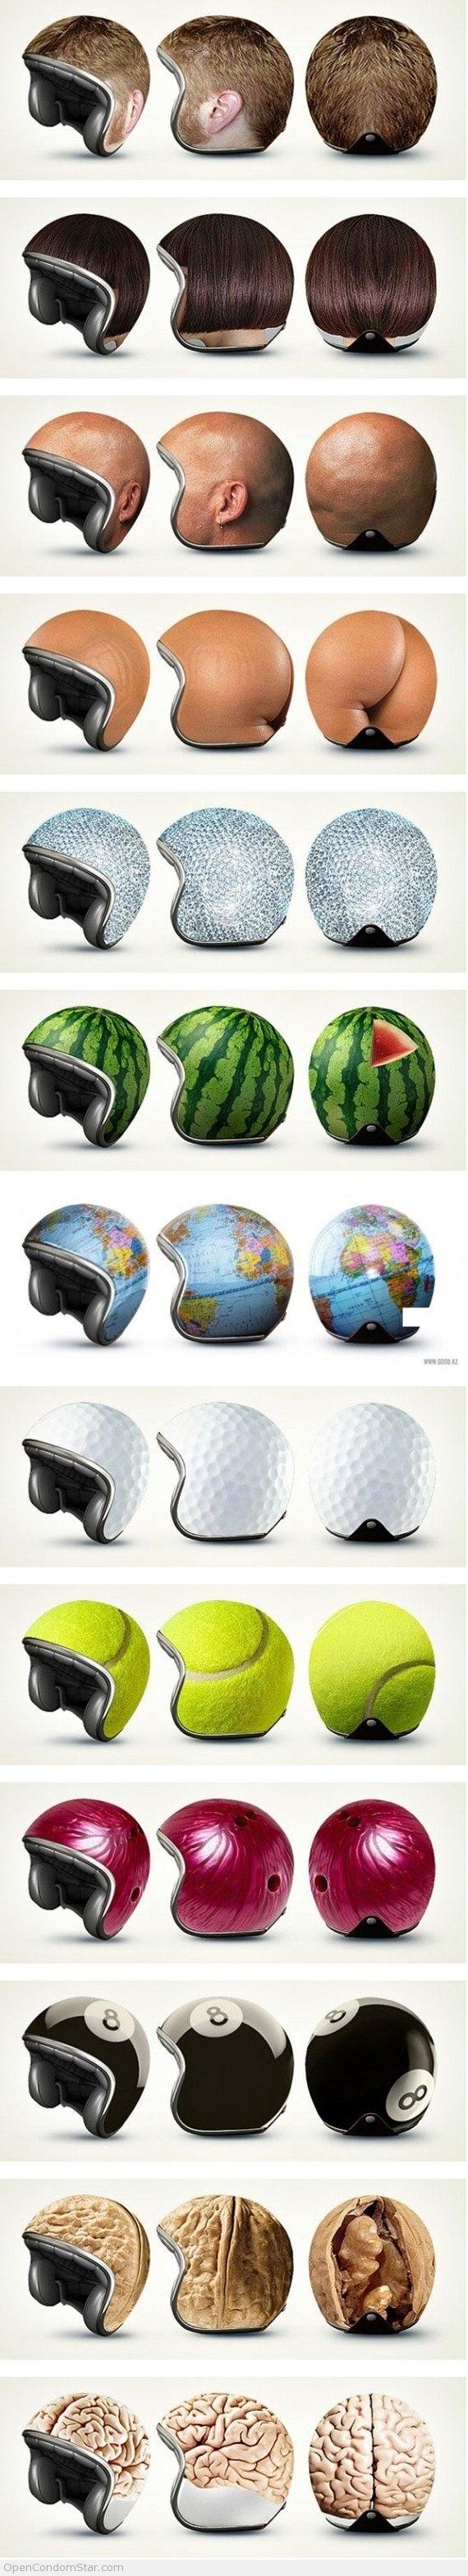 Artistic Helmet Design